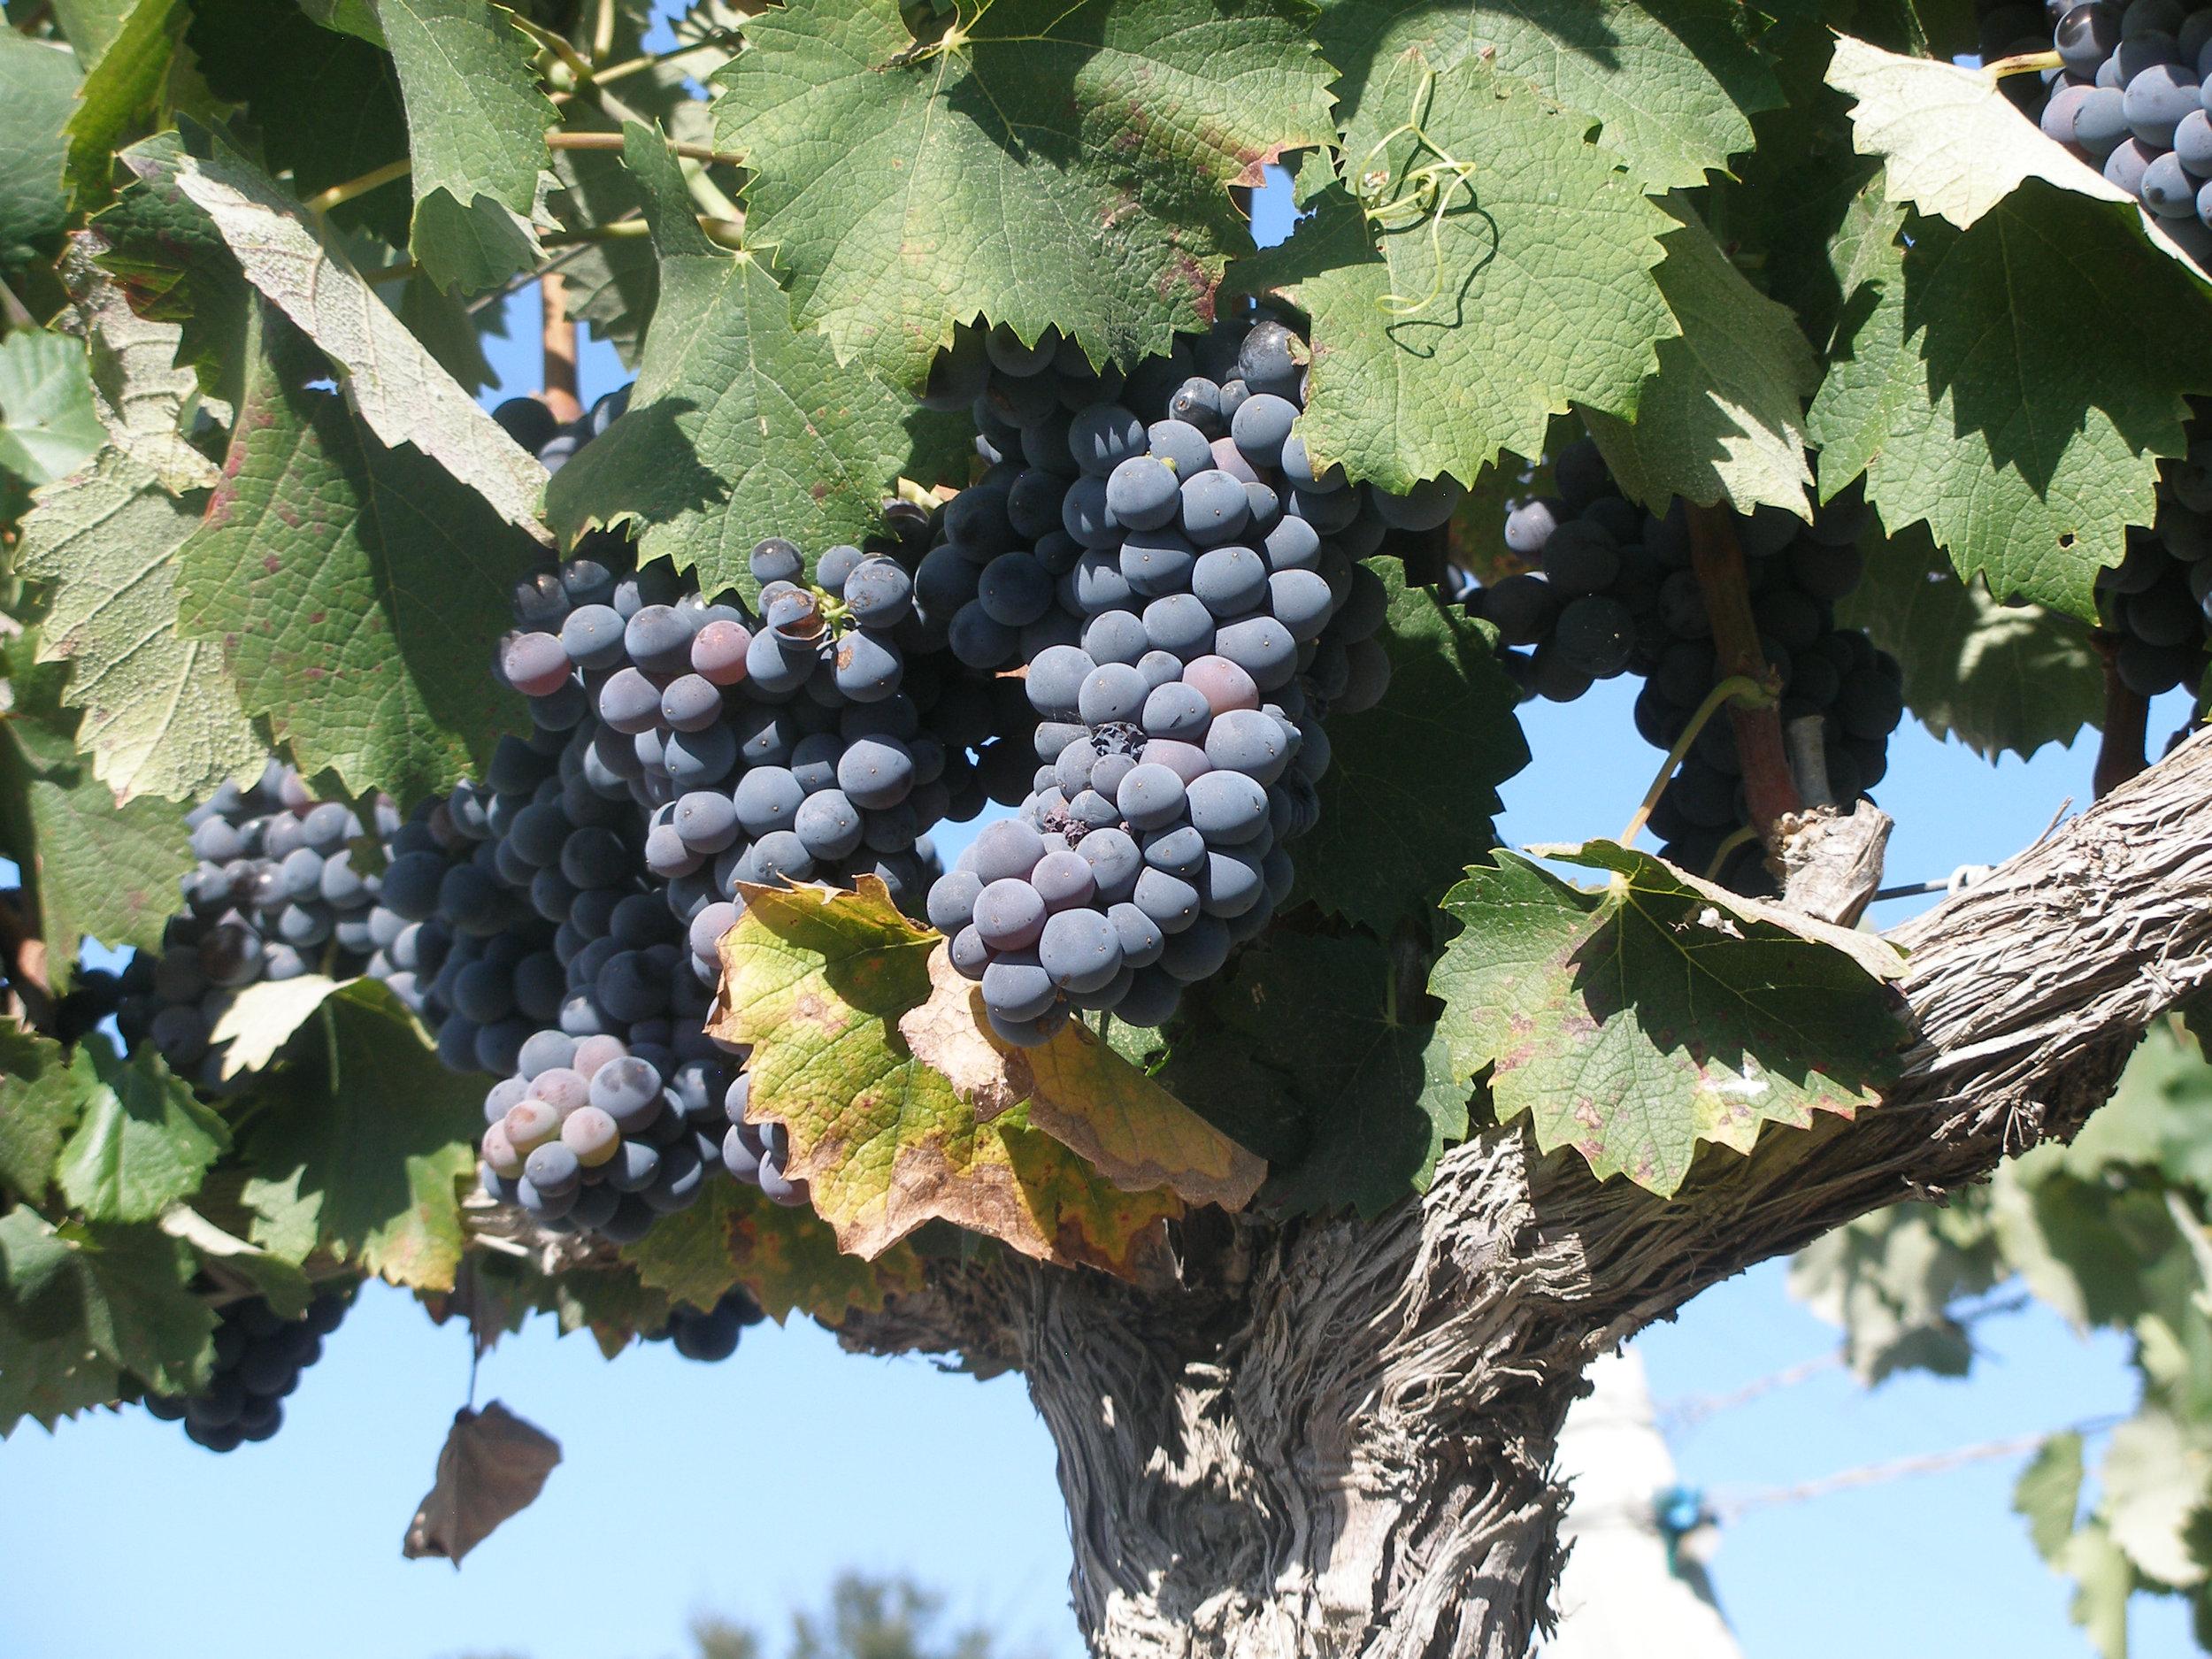 Property for Sale: 1575 Alisos Canyon, Happy Canyon, Santa Ynez, CA 93460 List Price: $7,750,000 108.8 acres 75 acres of vineyard Vogelzang Vineyard!